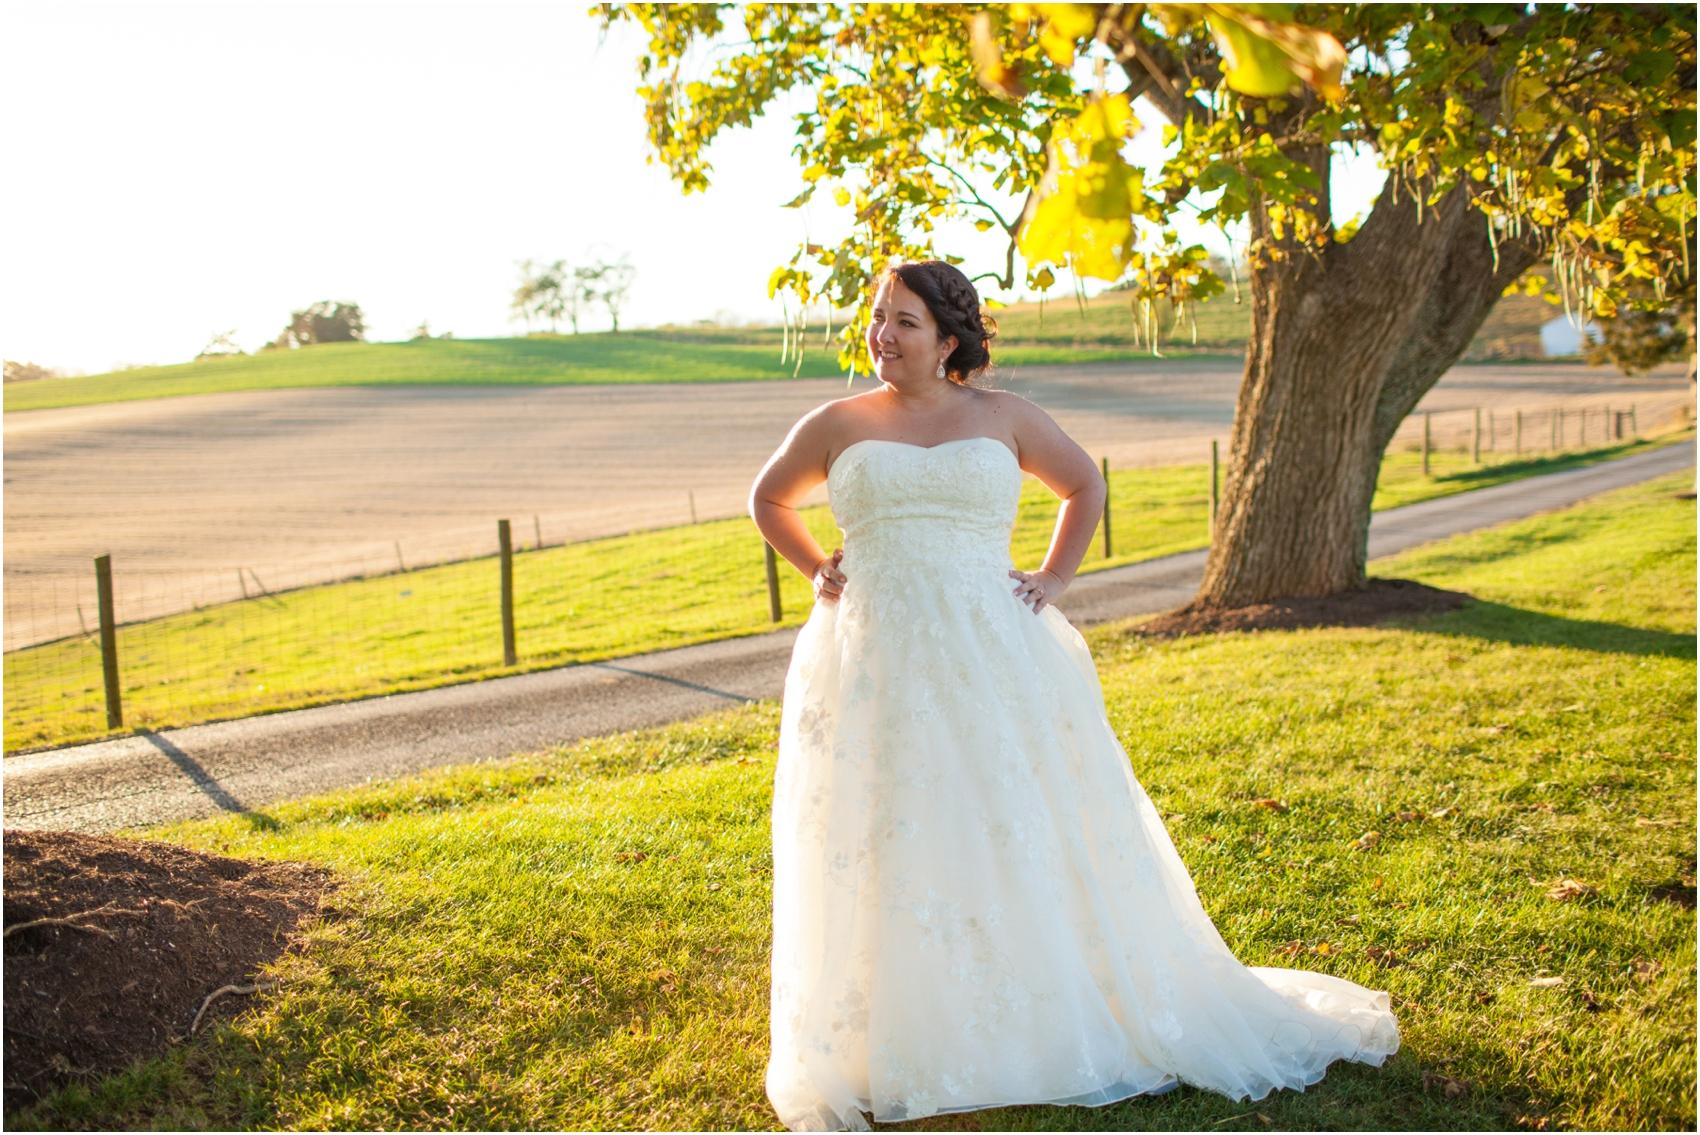 On-Sunny-Slope-Farm-Fall-Virginia-Wedding-3320.jpg